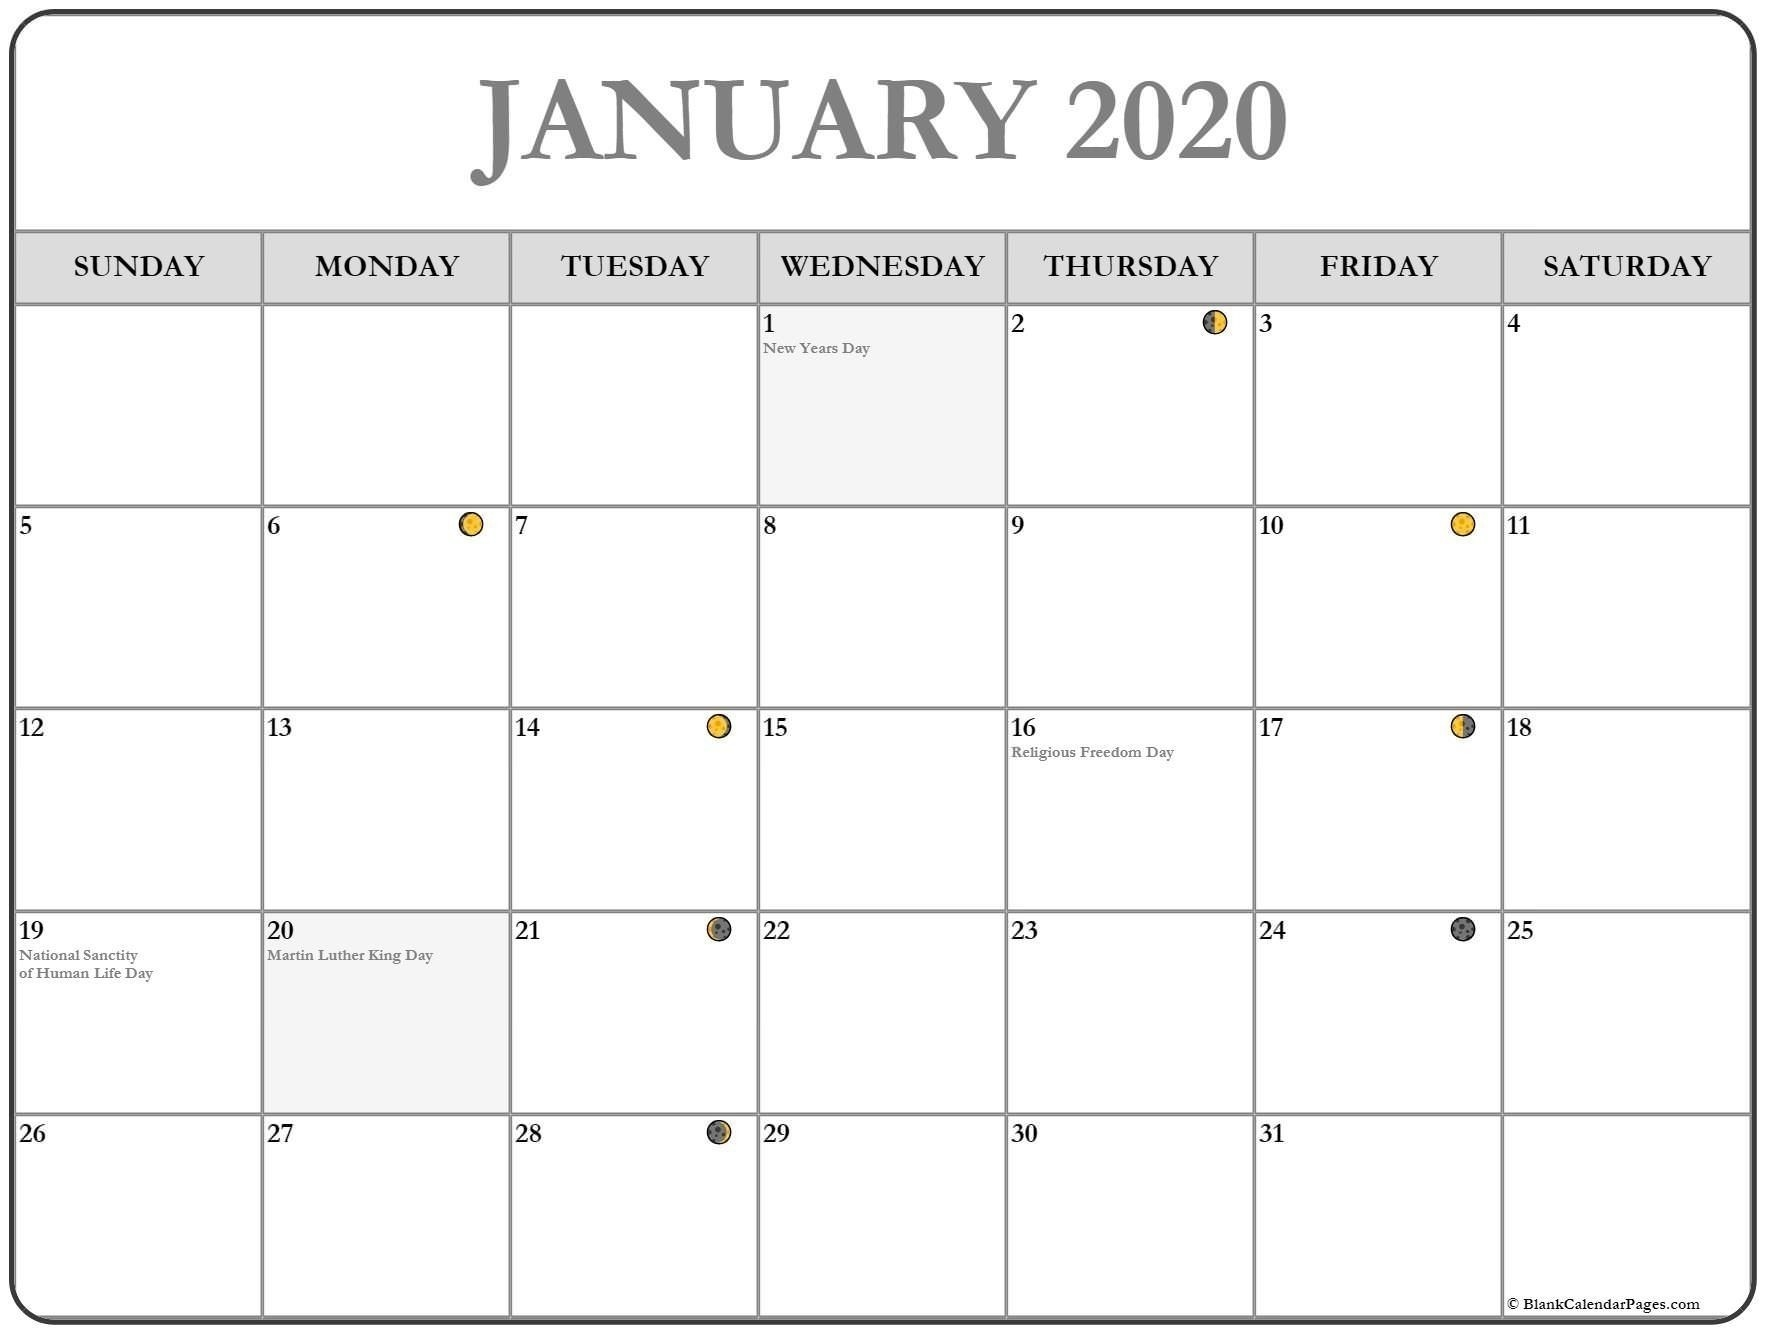 October 2019 Lunar Calendar | Calendar Template-January 2020 Lunar Calendar